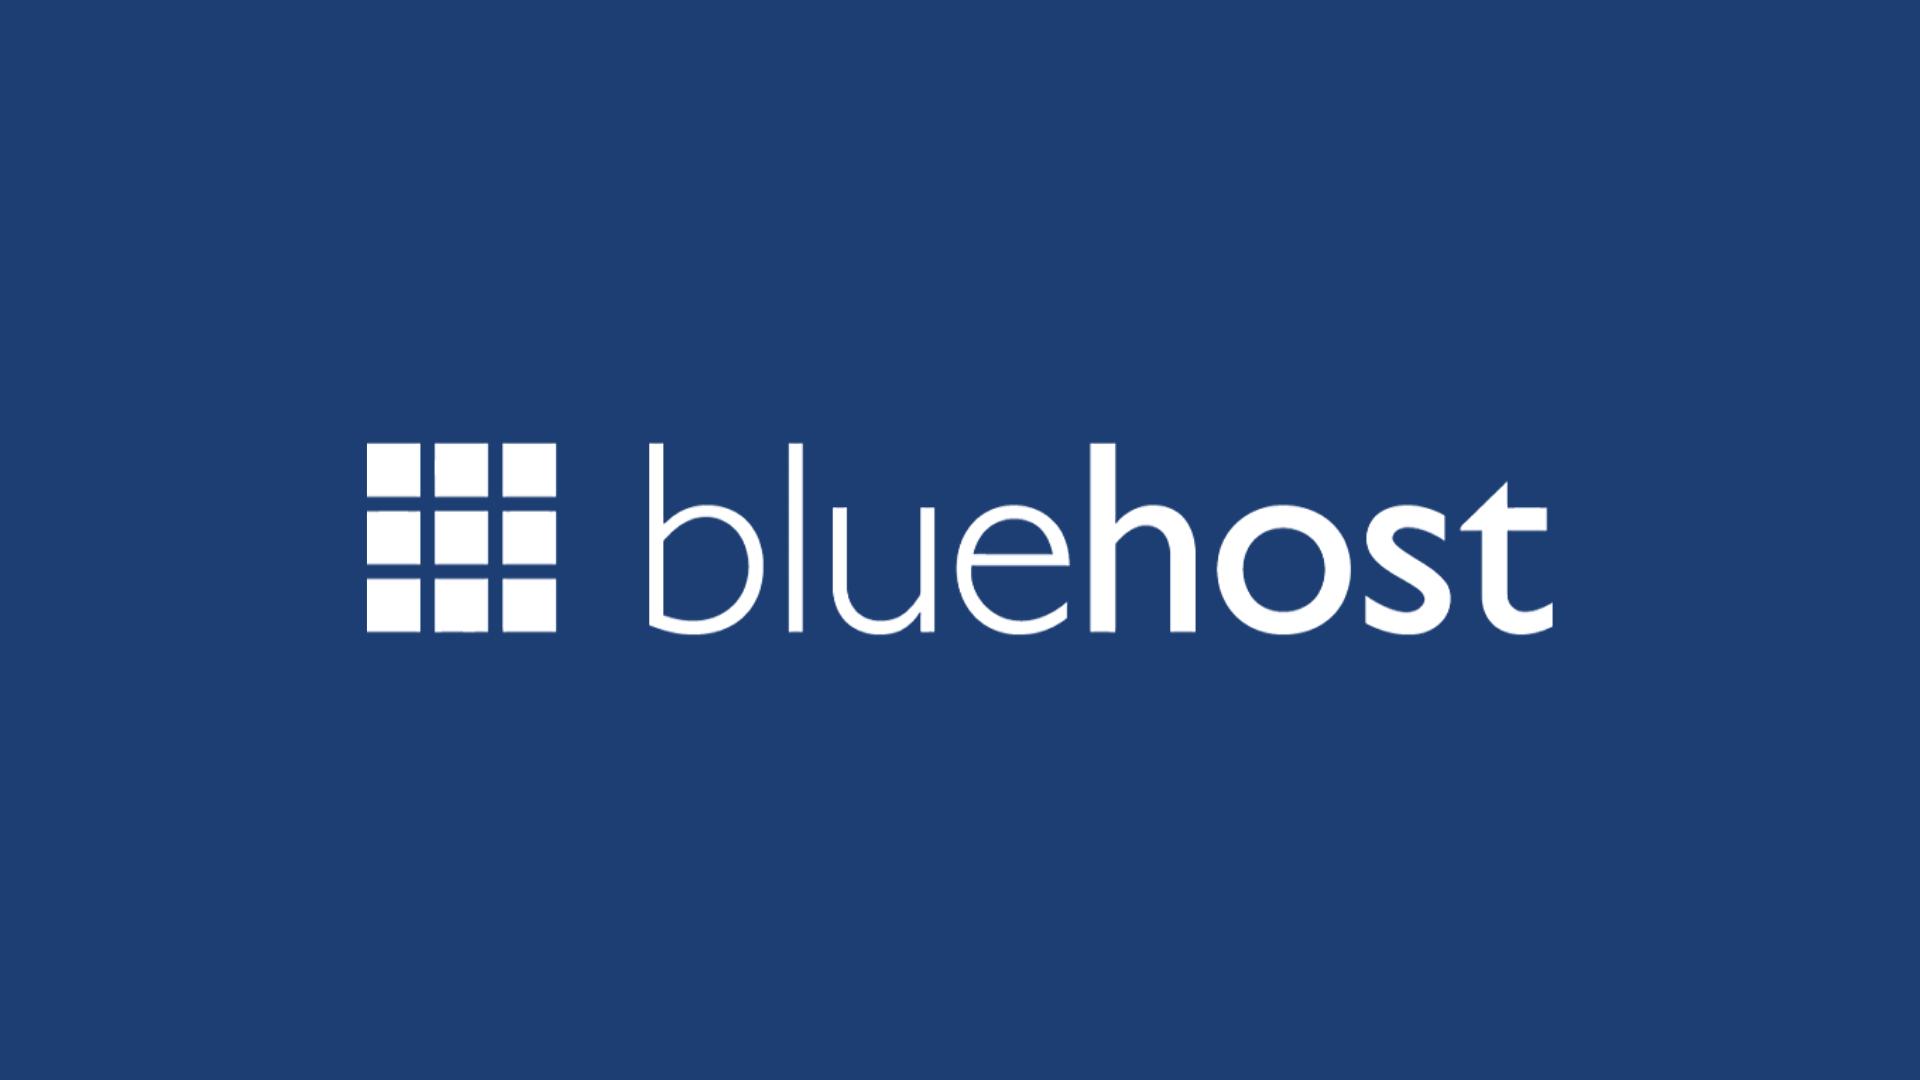 Bluehost 虚拟主机评价